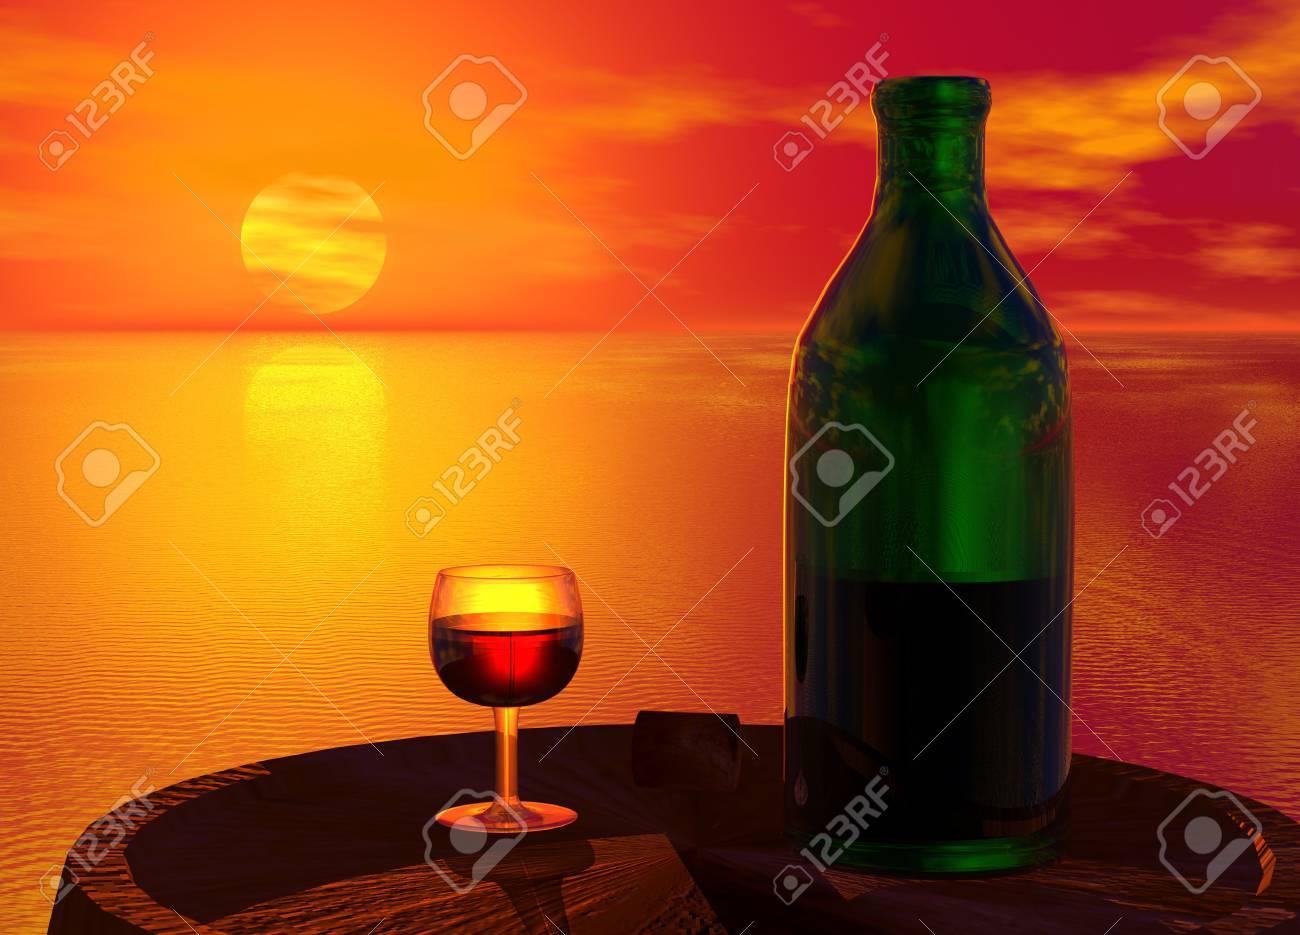 Green Bottle and Glass of Wine on Barrel Keg Stock Photo - 3846726